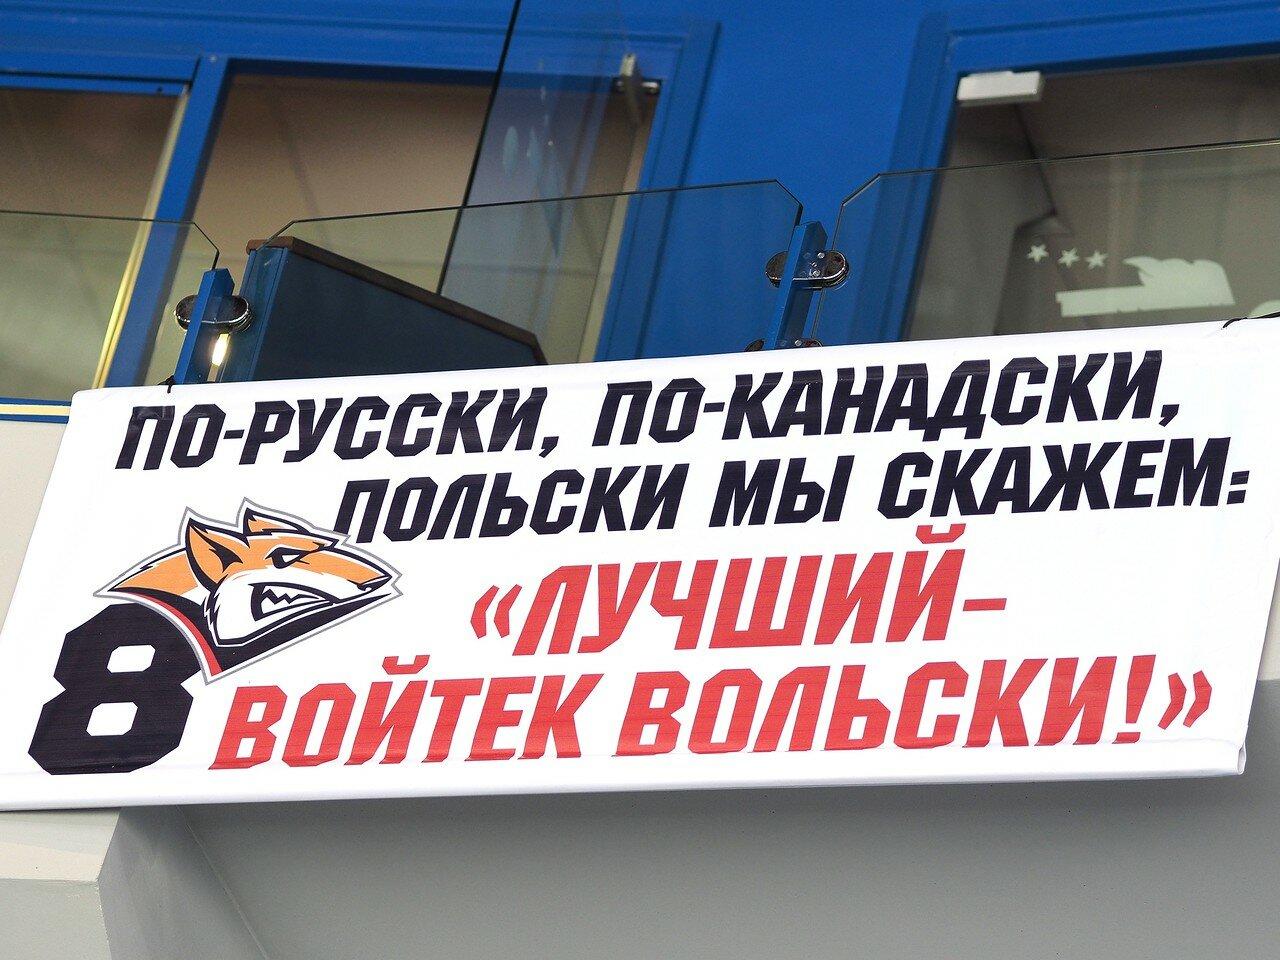 164Восток 1/2 плей-офф Металлург - Сибирь 08.03.2016